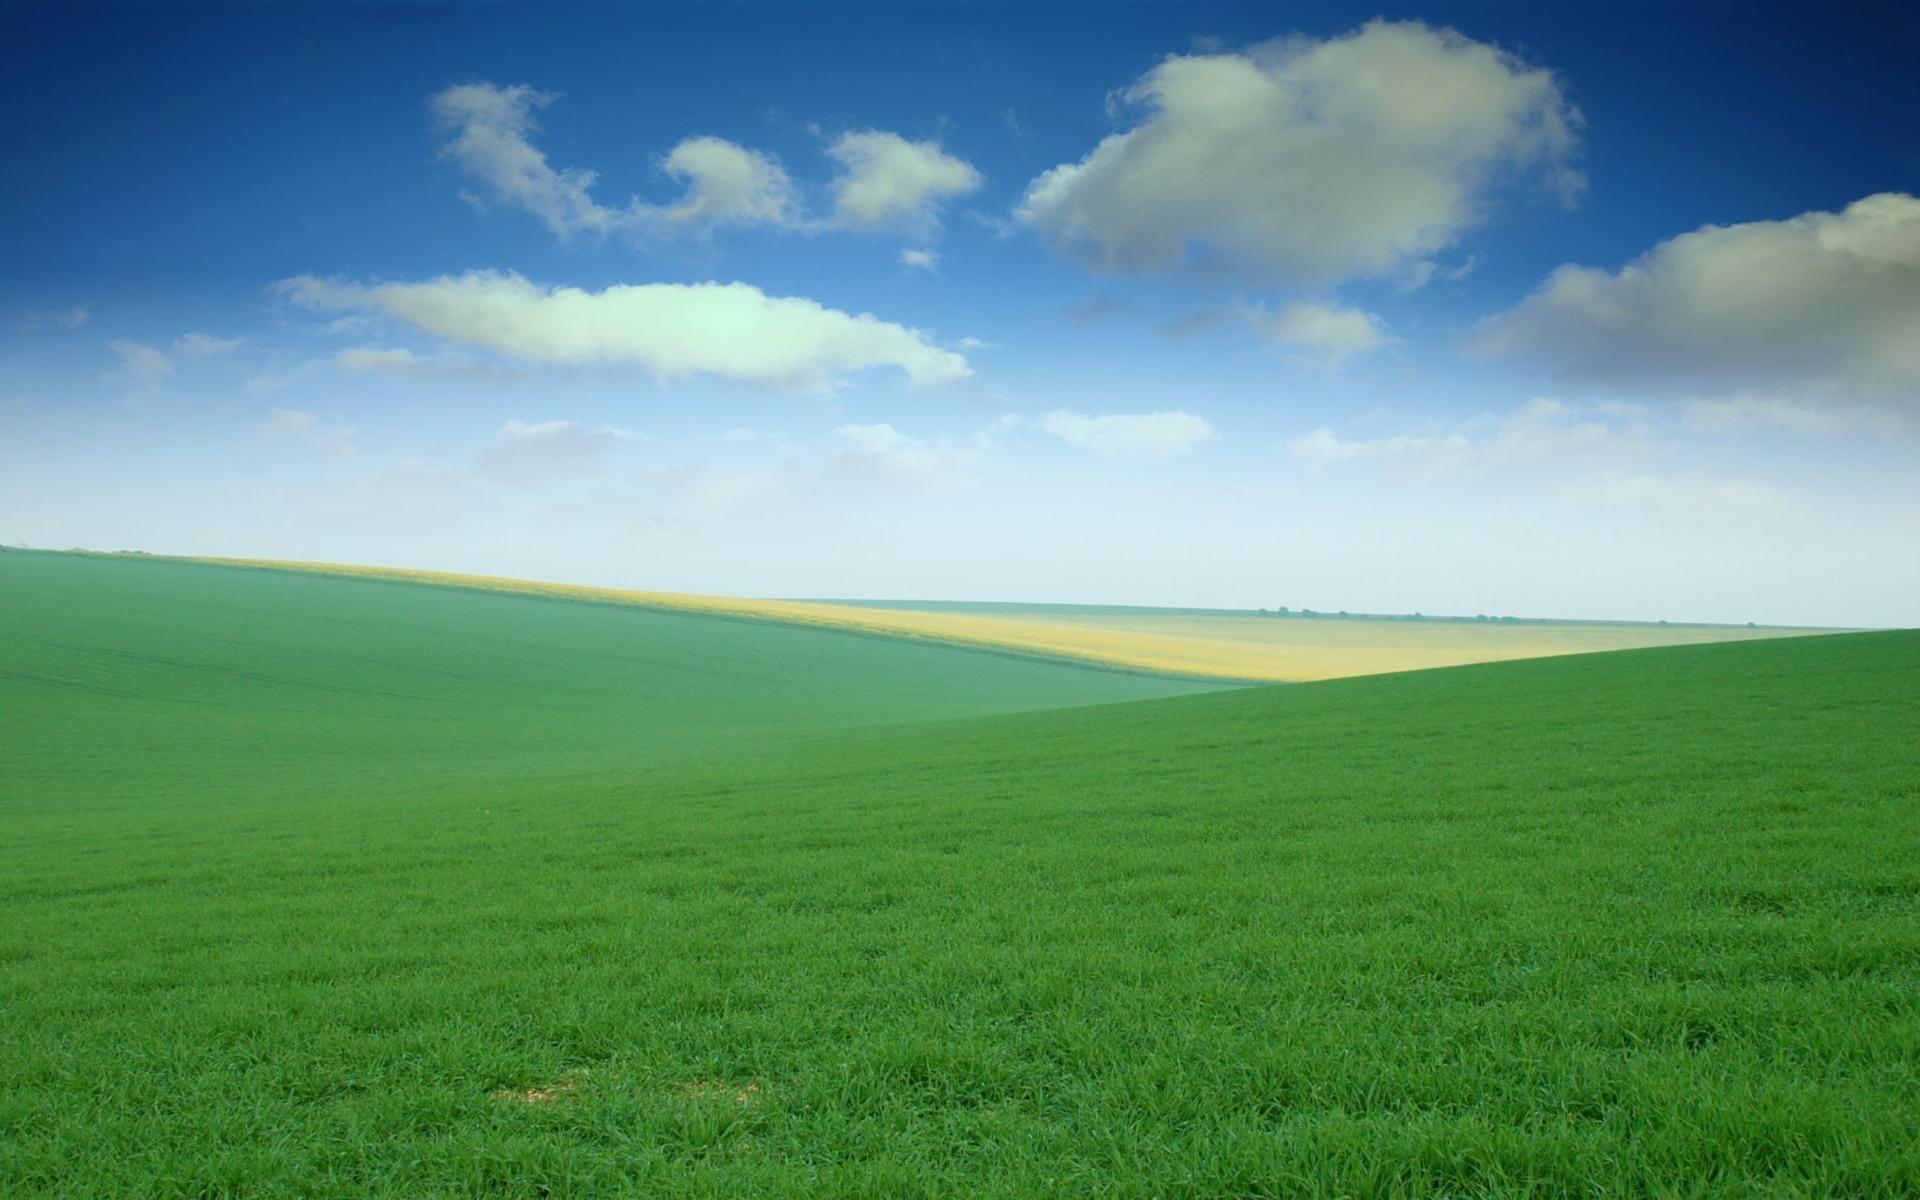 Green field clipart.